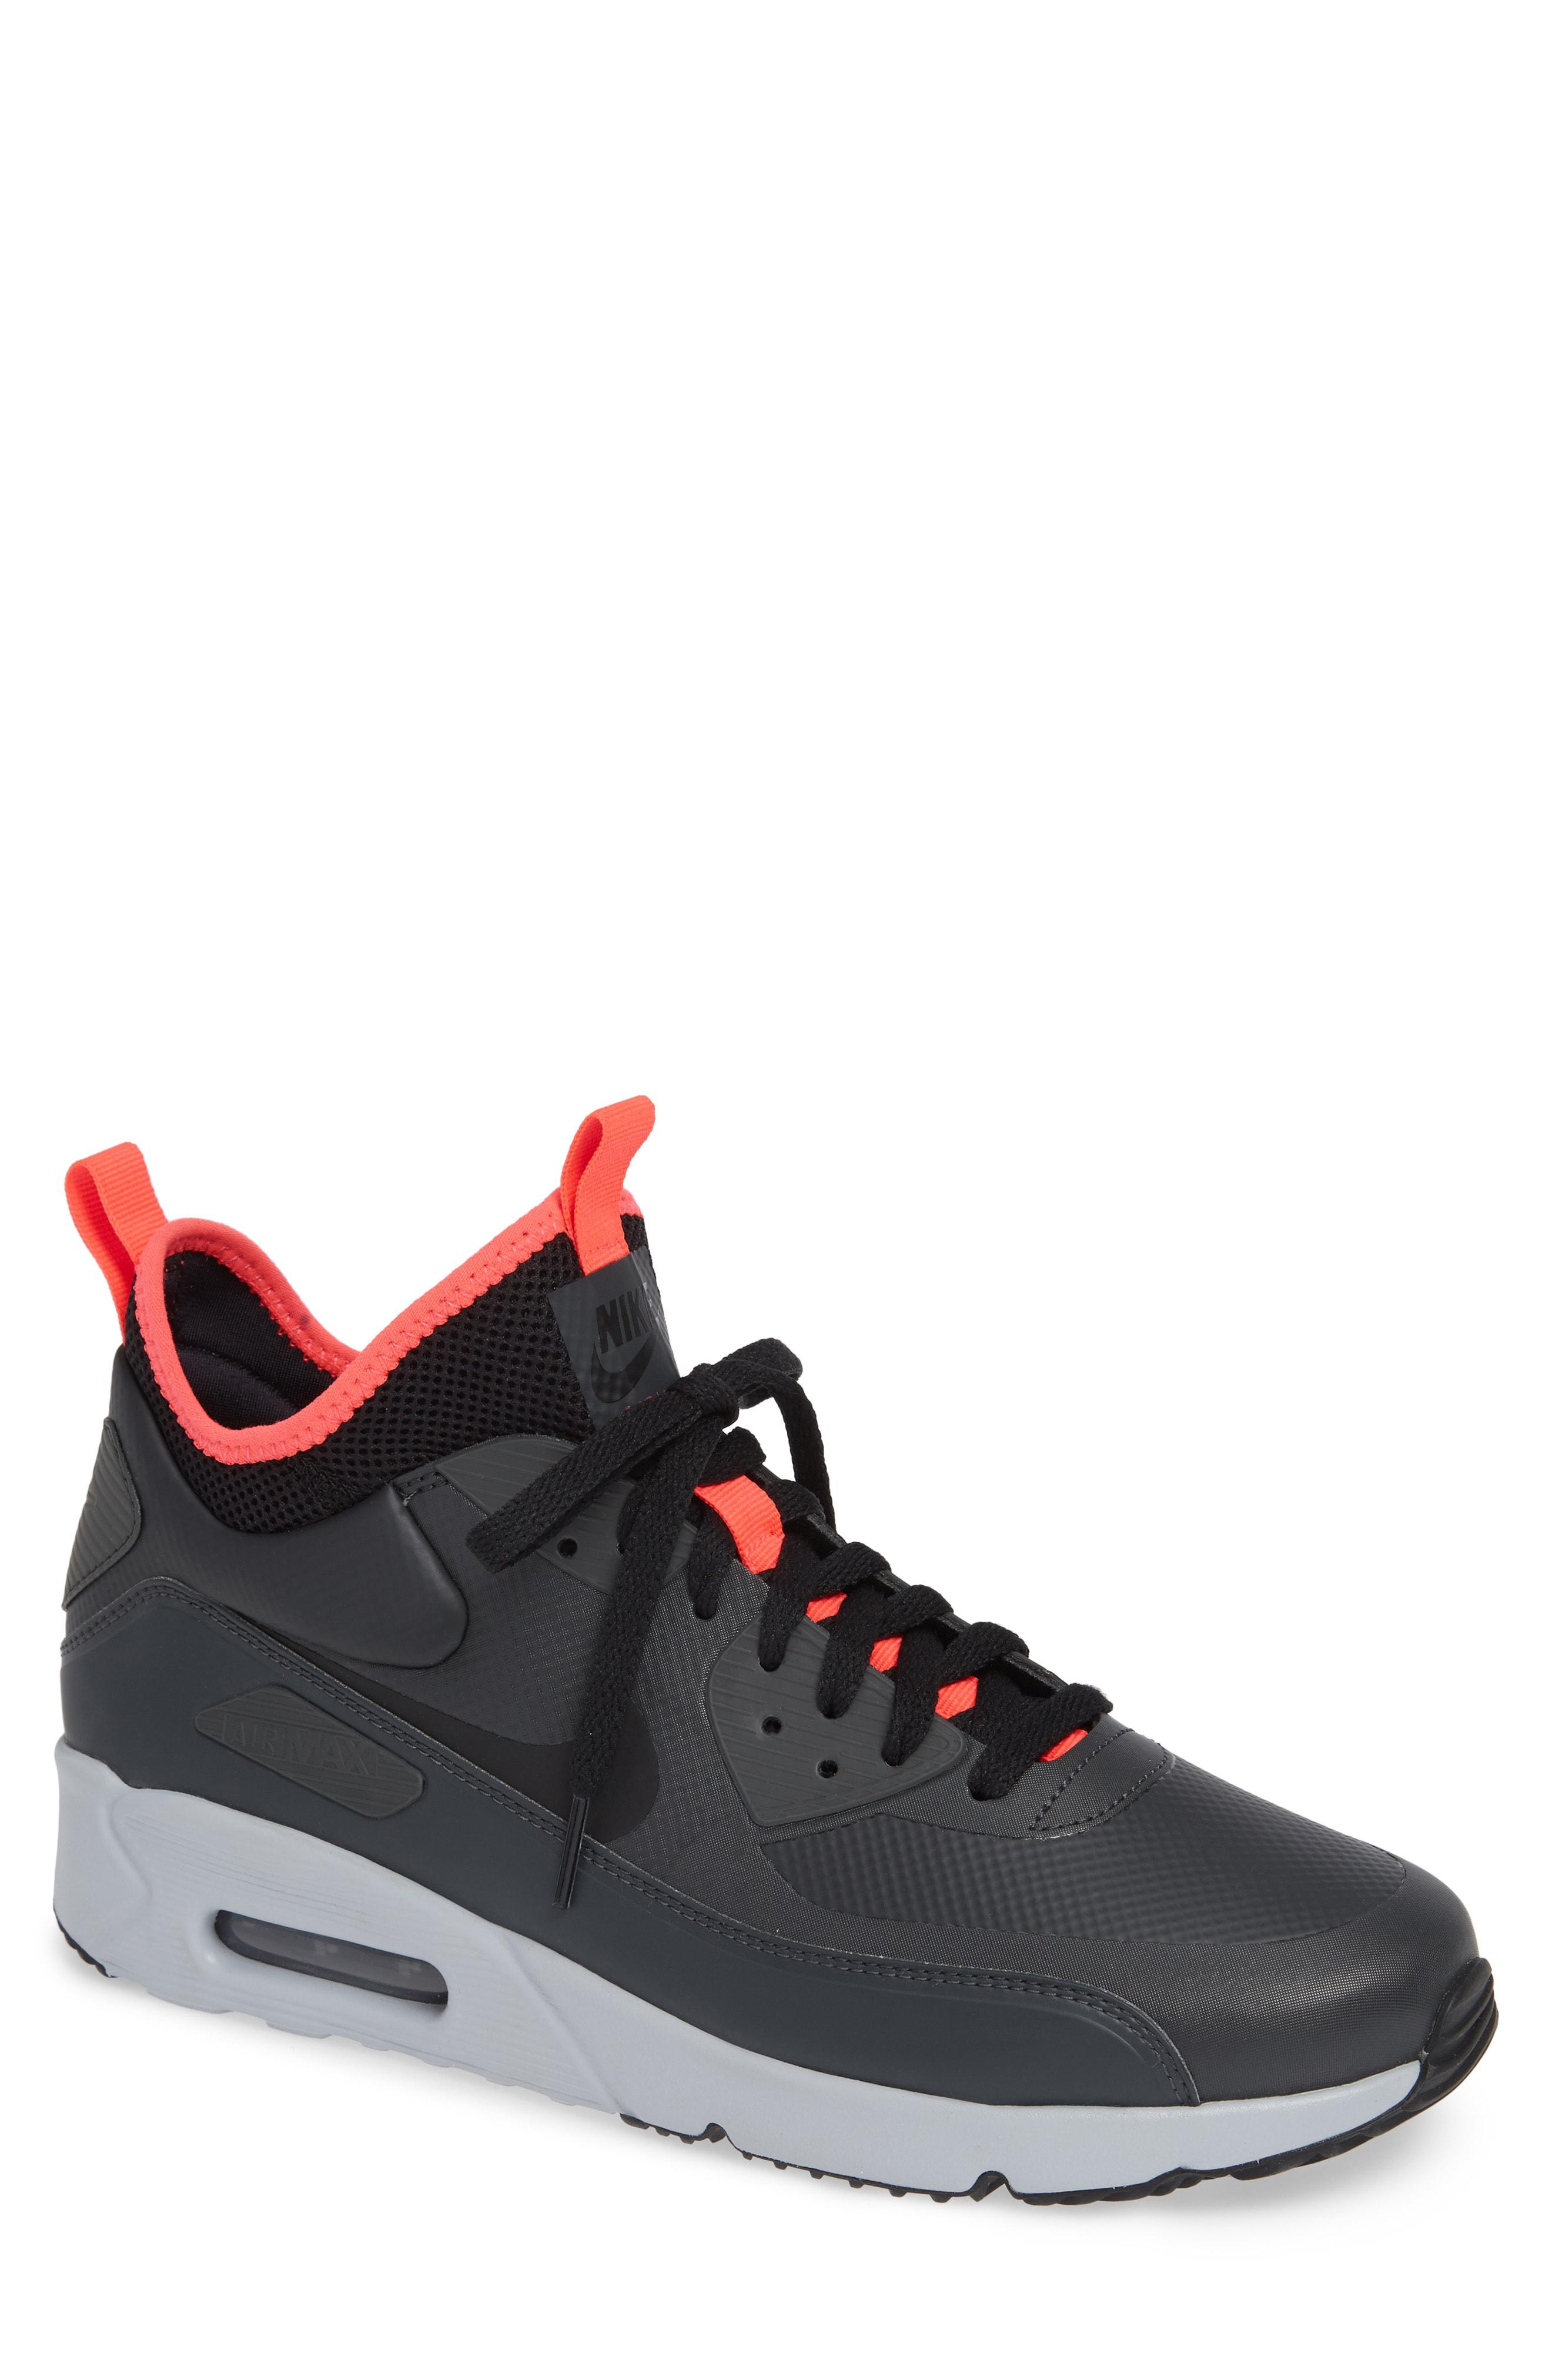 Nike Air Max 90 Ultra Mid Winter AA4423 001 Sneaker Bar